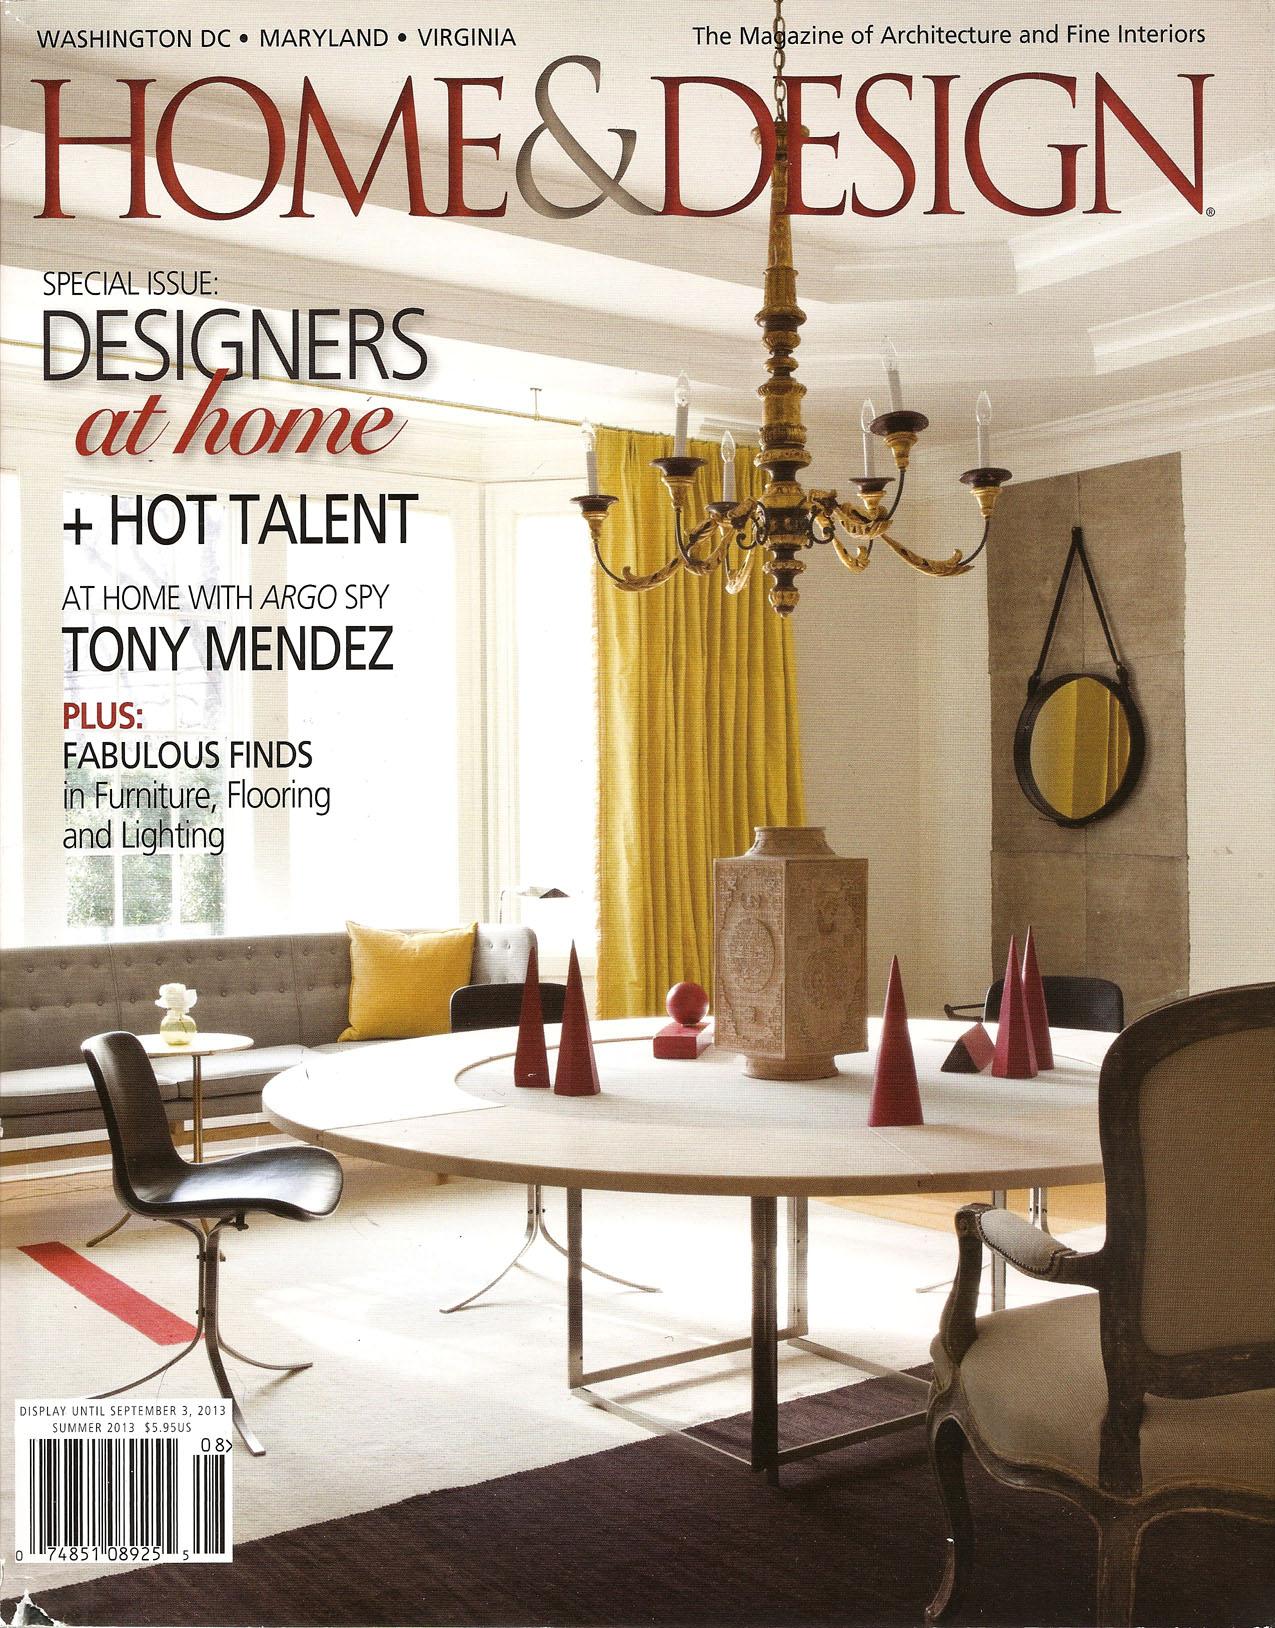 Home & Design Summer 2013